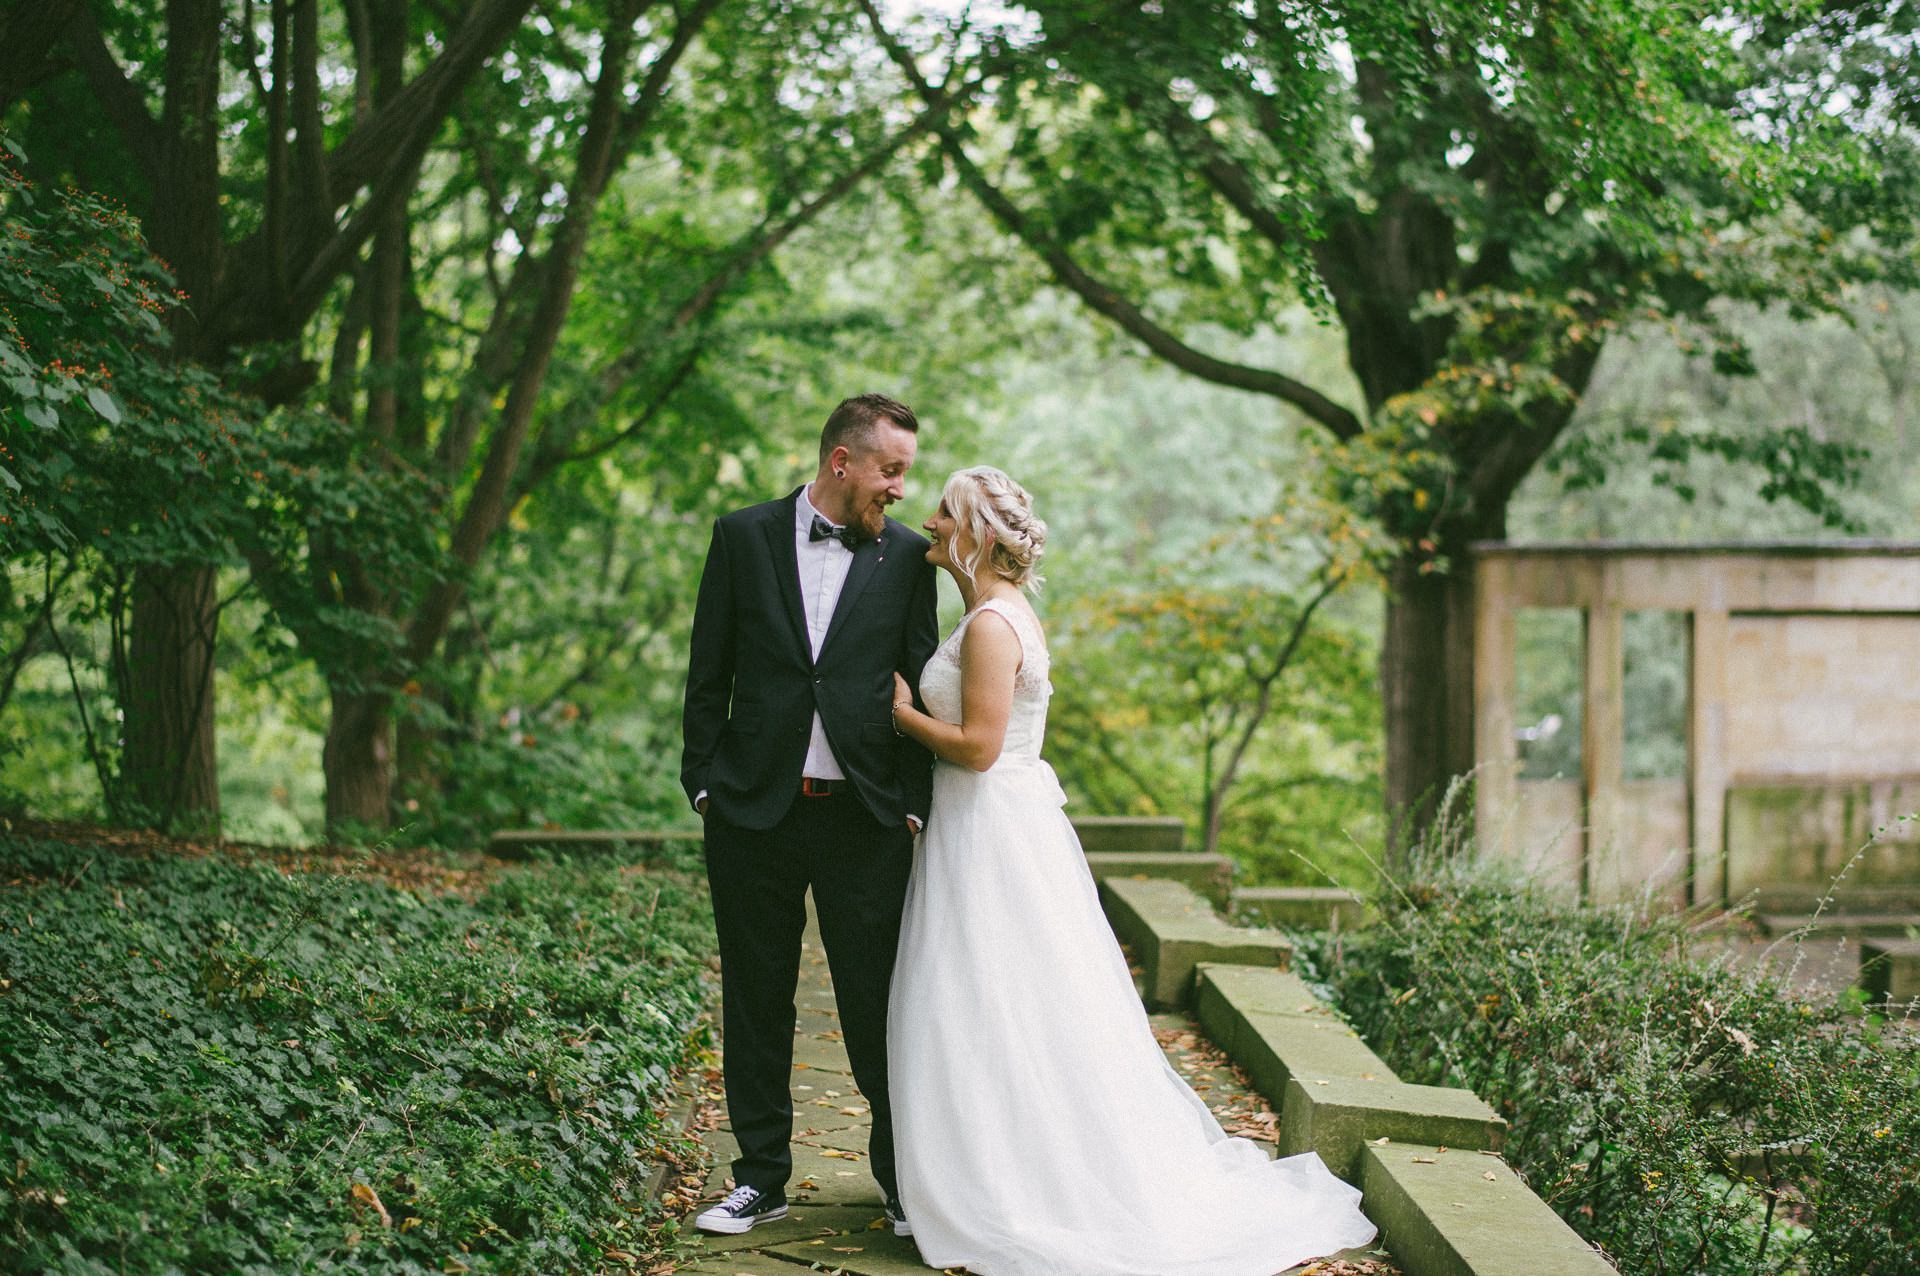 Goldhorn Brewery Wedding Photos in Cleveland 1 45.jpg